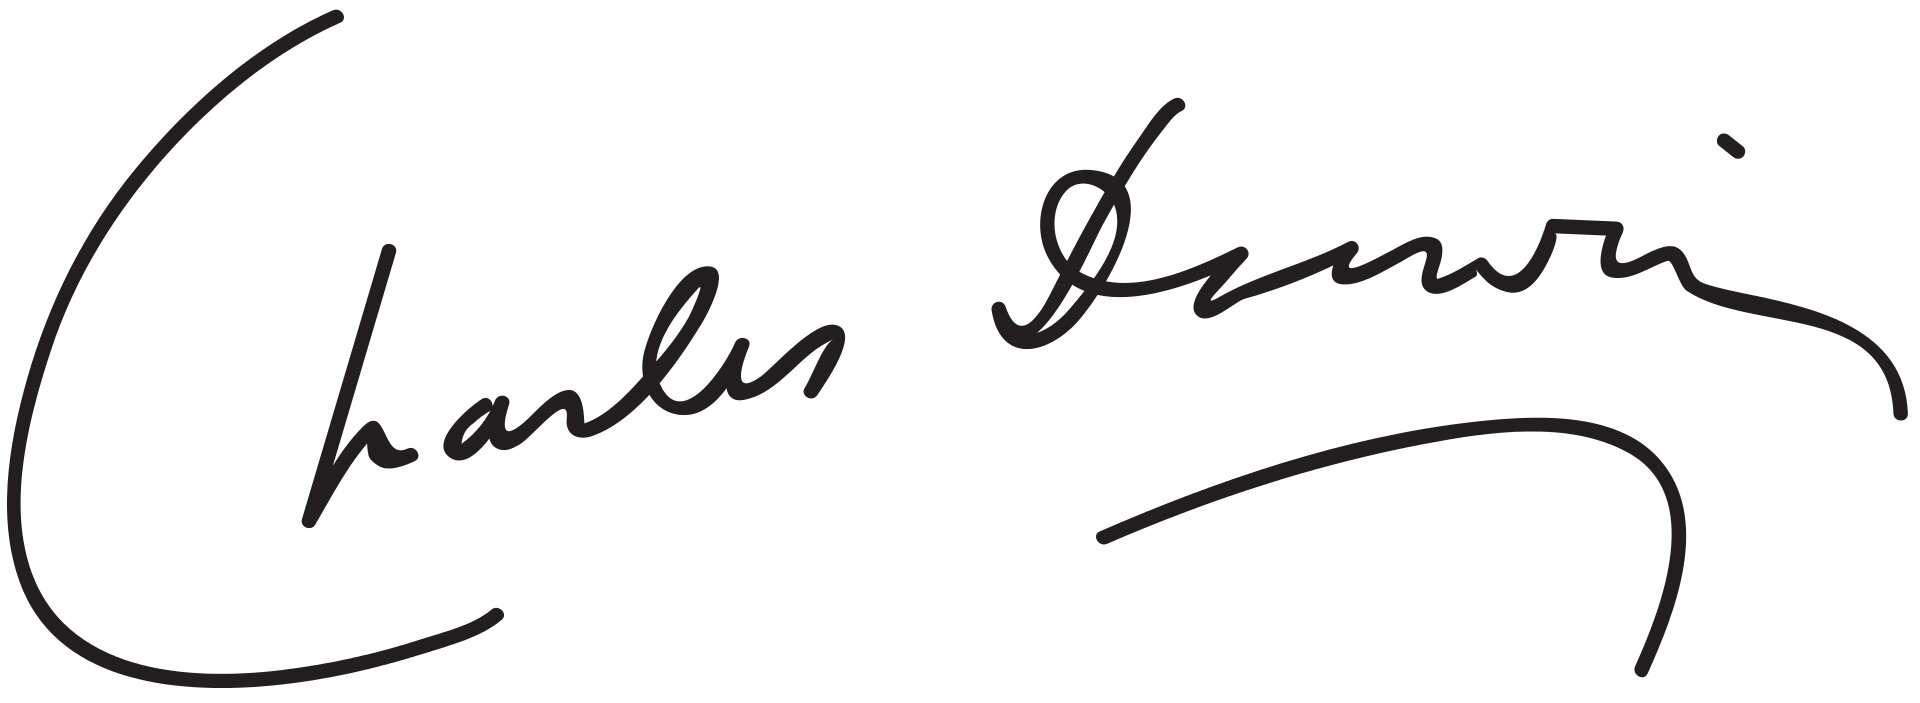 Charles Darwin Signature